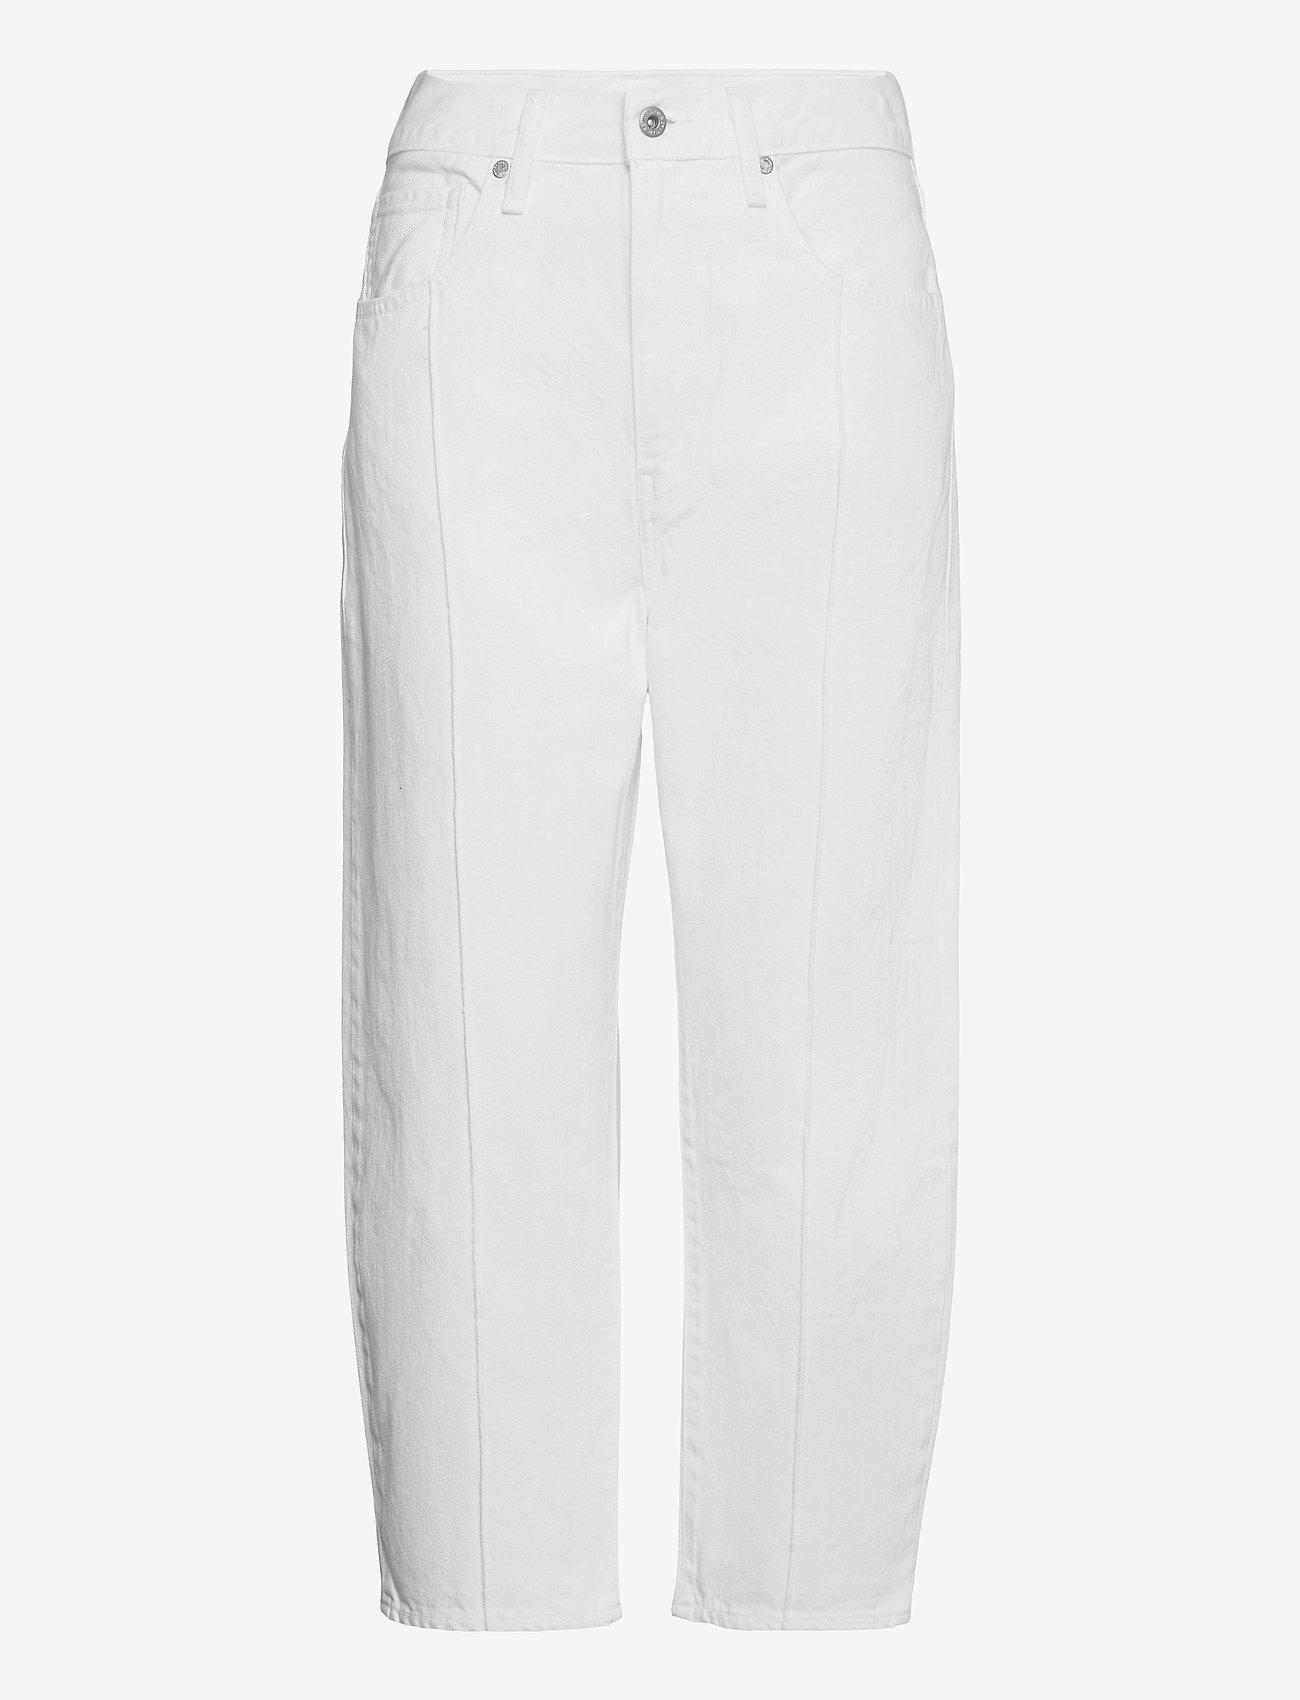 Levi's Made & Crafted - LMC BARREL LMC WHITE SAILS MOJ - mom jeans - neutrals - 0